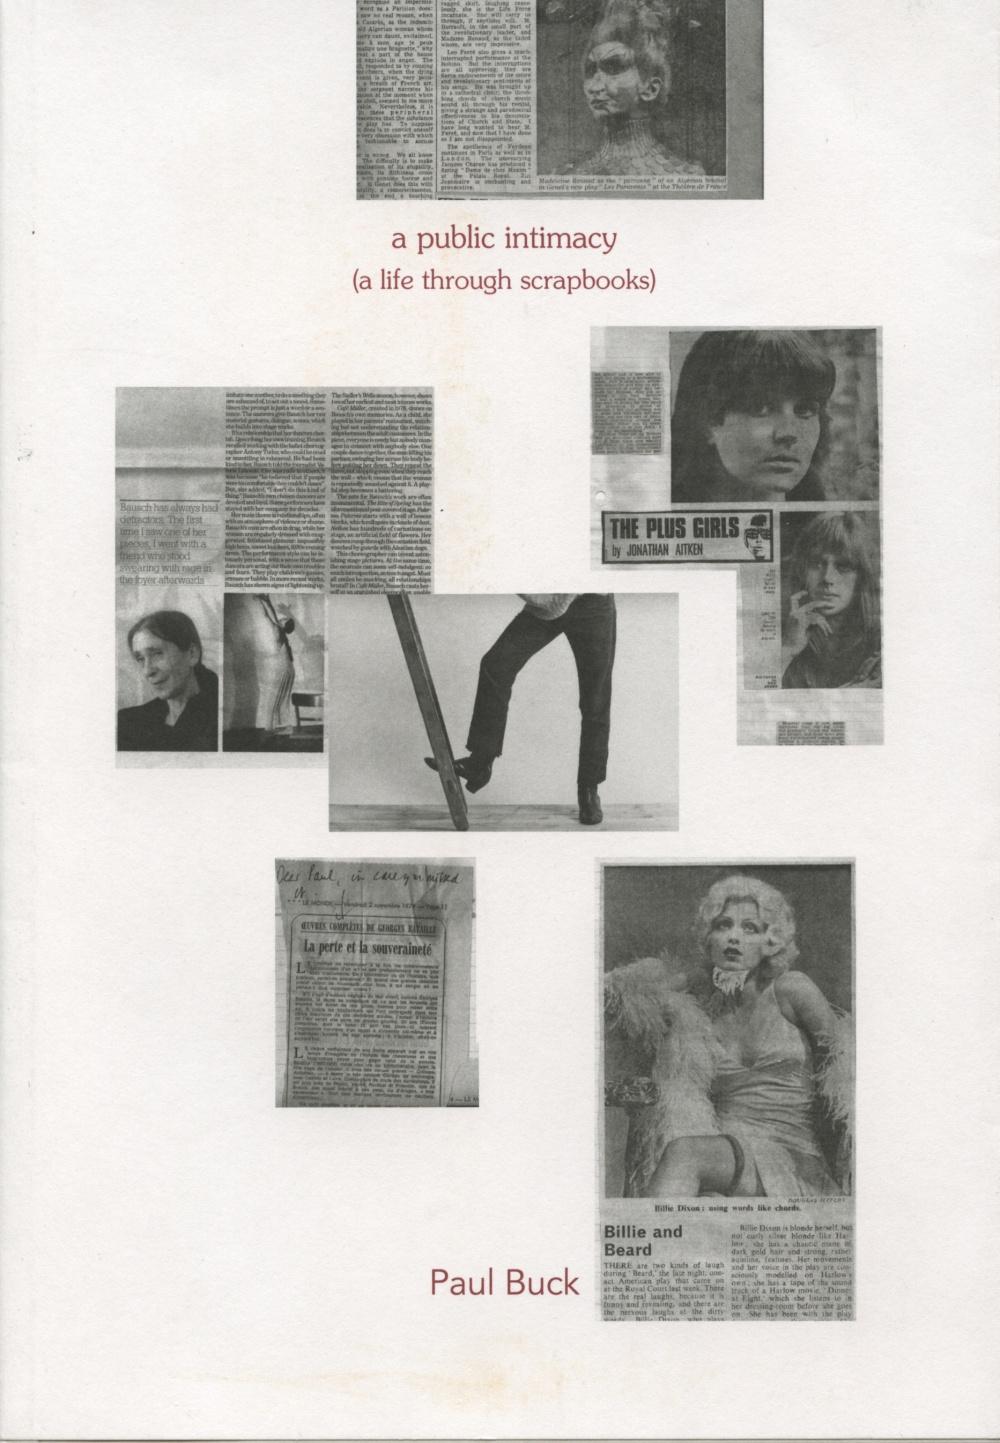 A Public Intimacy (A Life Through Scrapbooks)